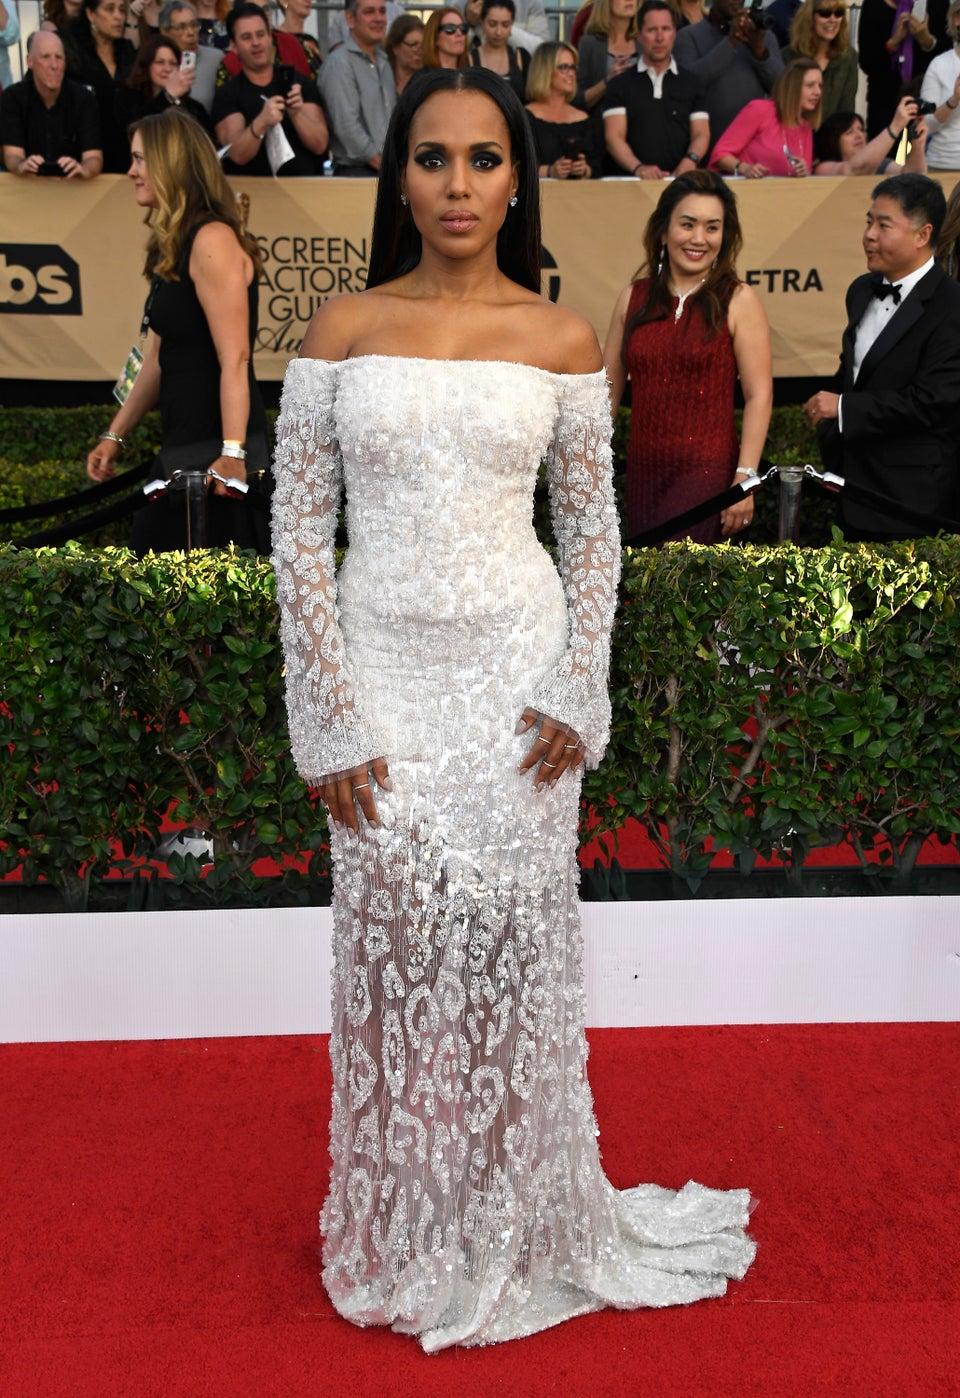 Kerry Washington Makes Political Fashion Statement at SAG Awards